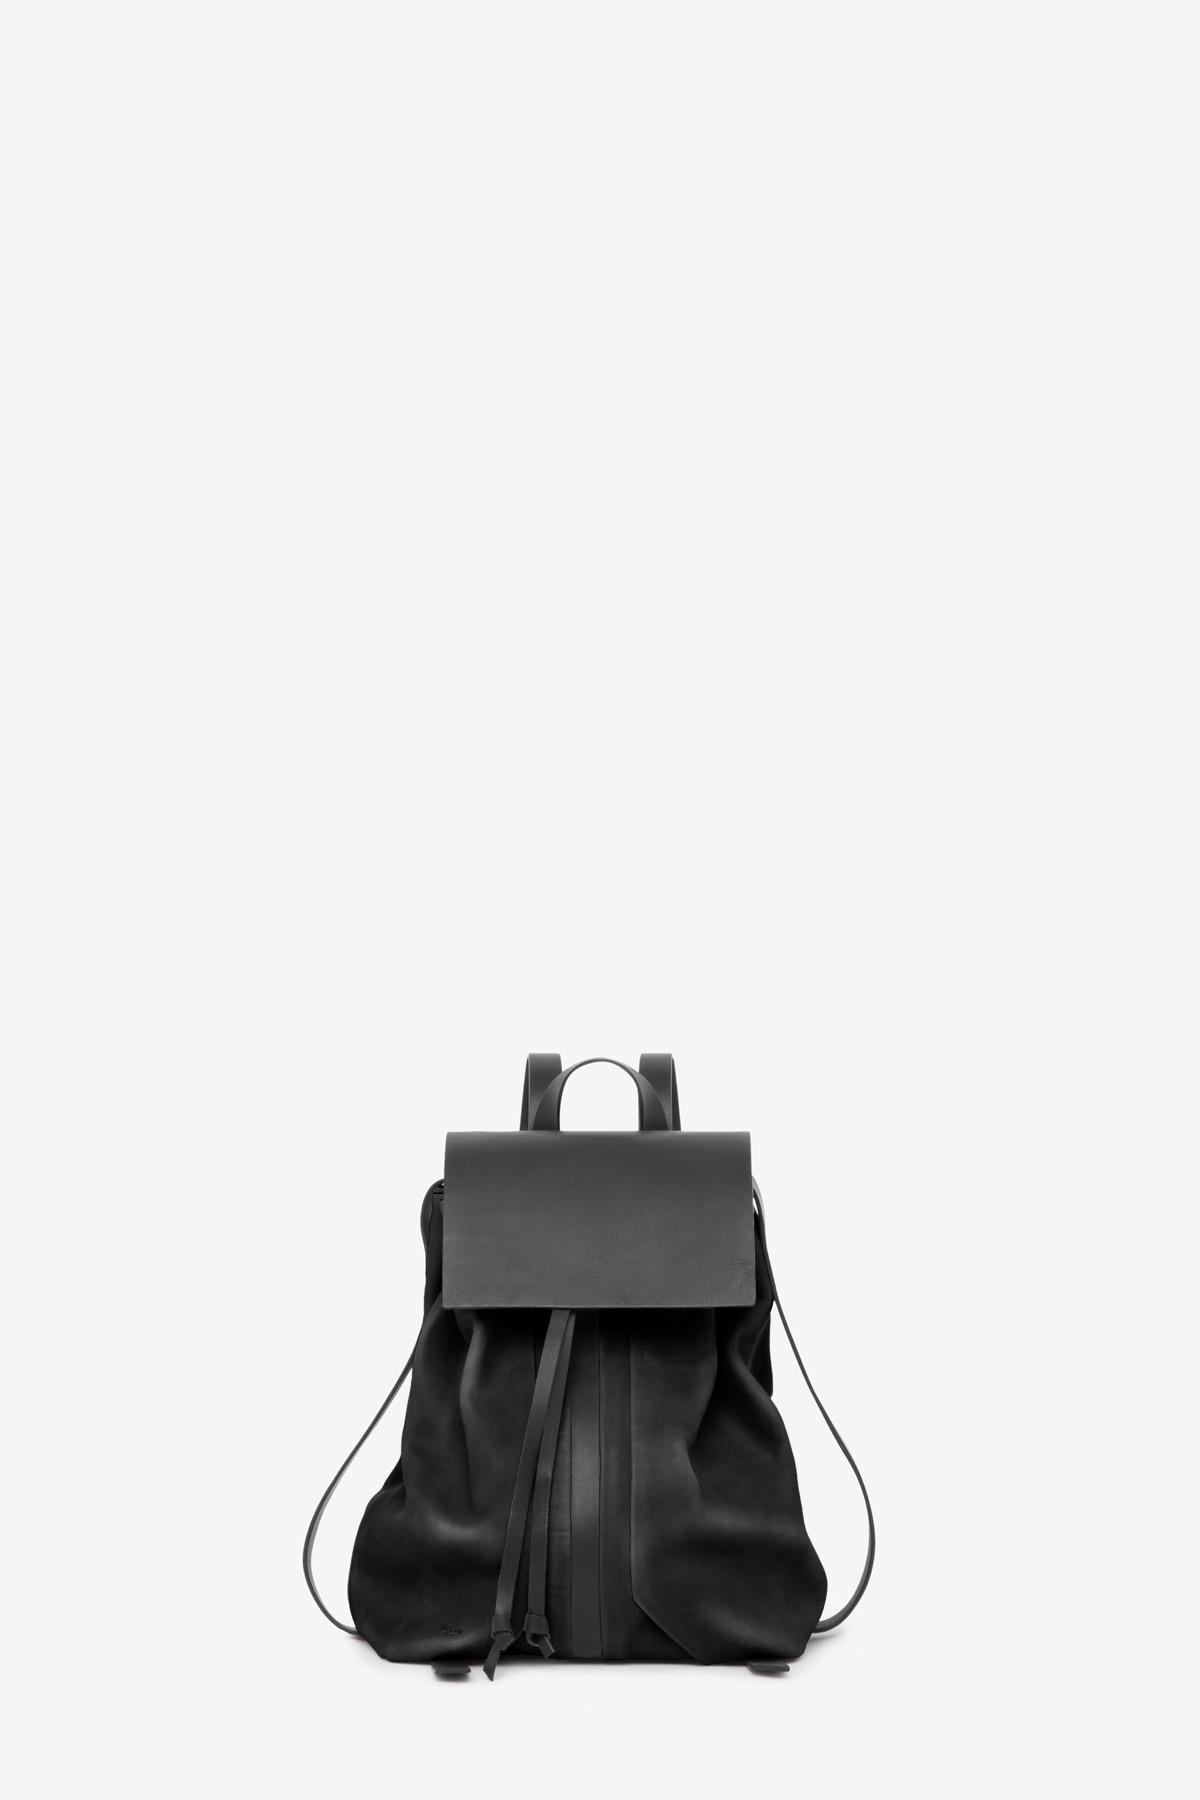 dclr009-b-backpack-a1-black-front